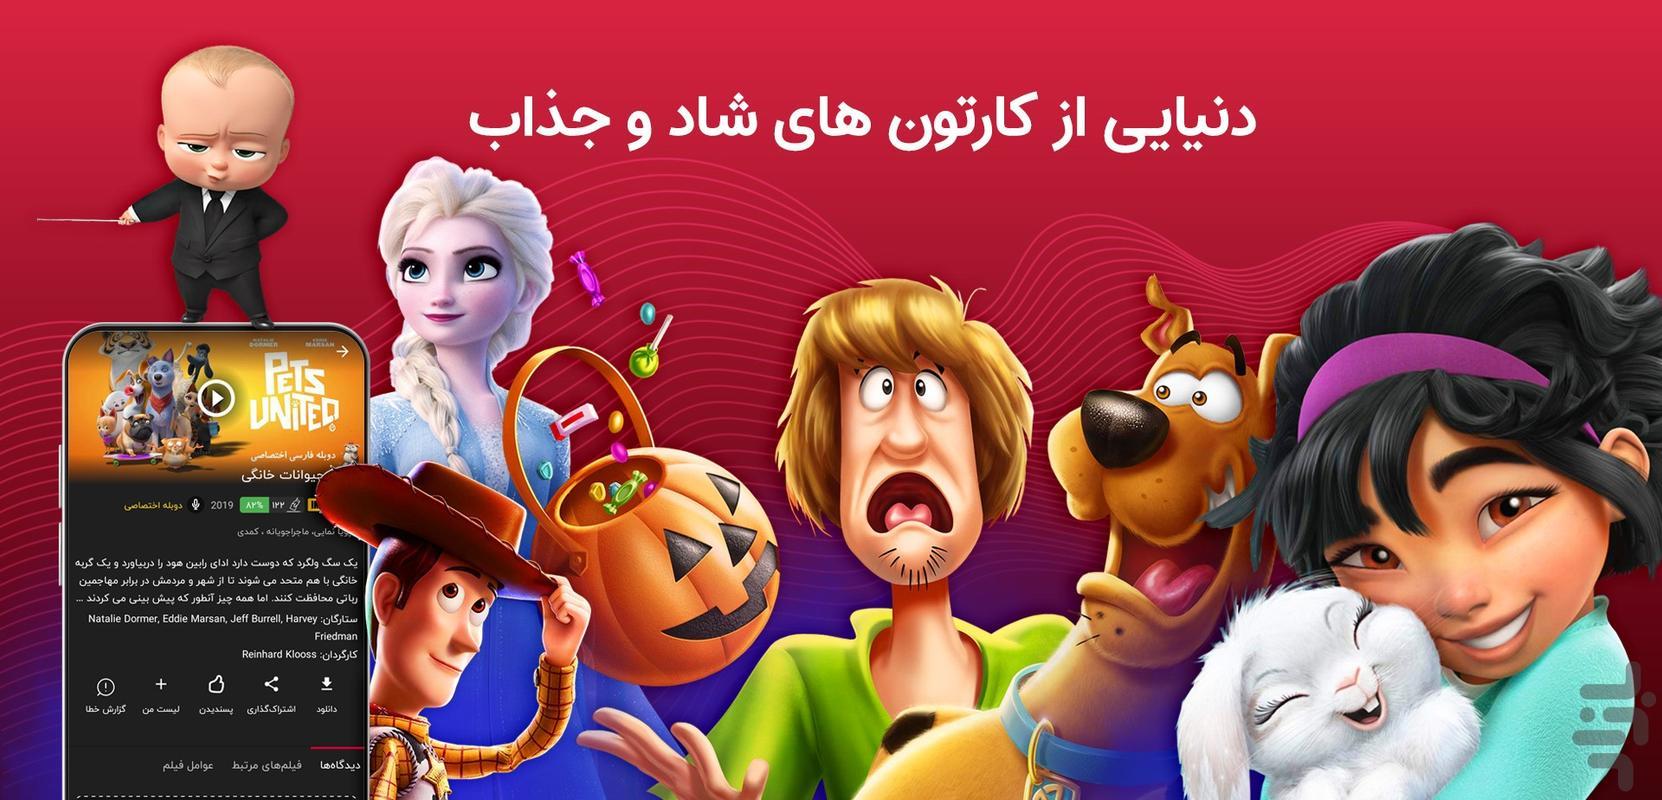 کینگ مووی (فیلم و سریال و انیمیشن) - عکس برنامه موبایلی اندروید